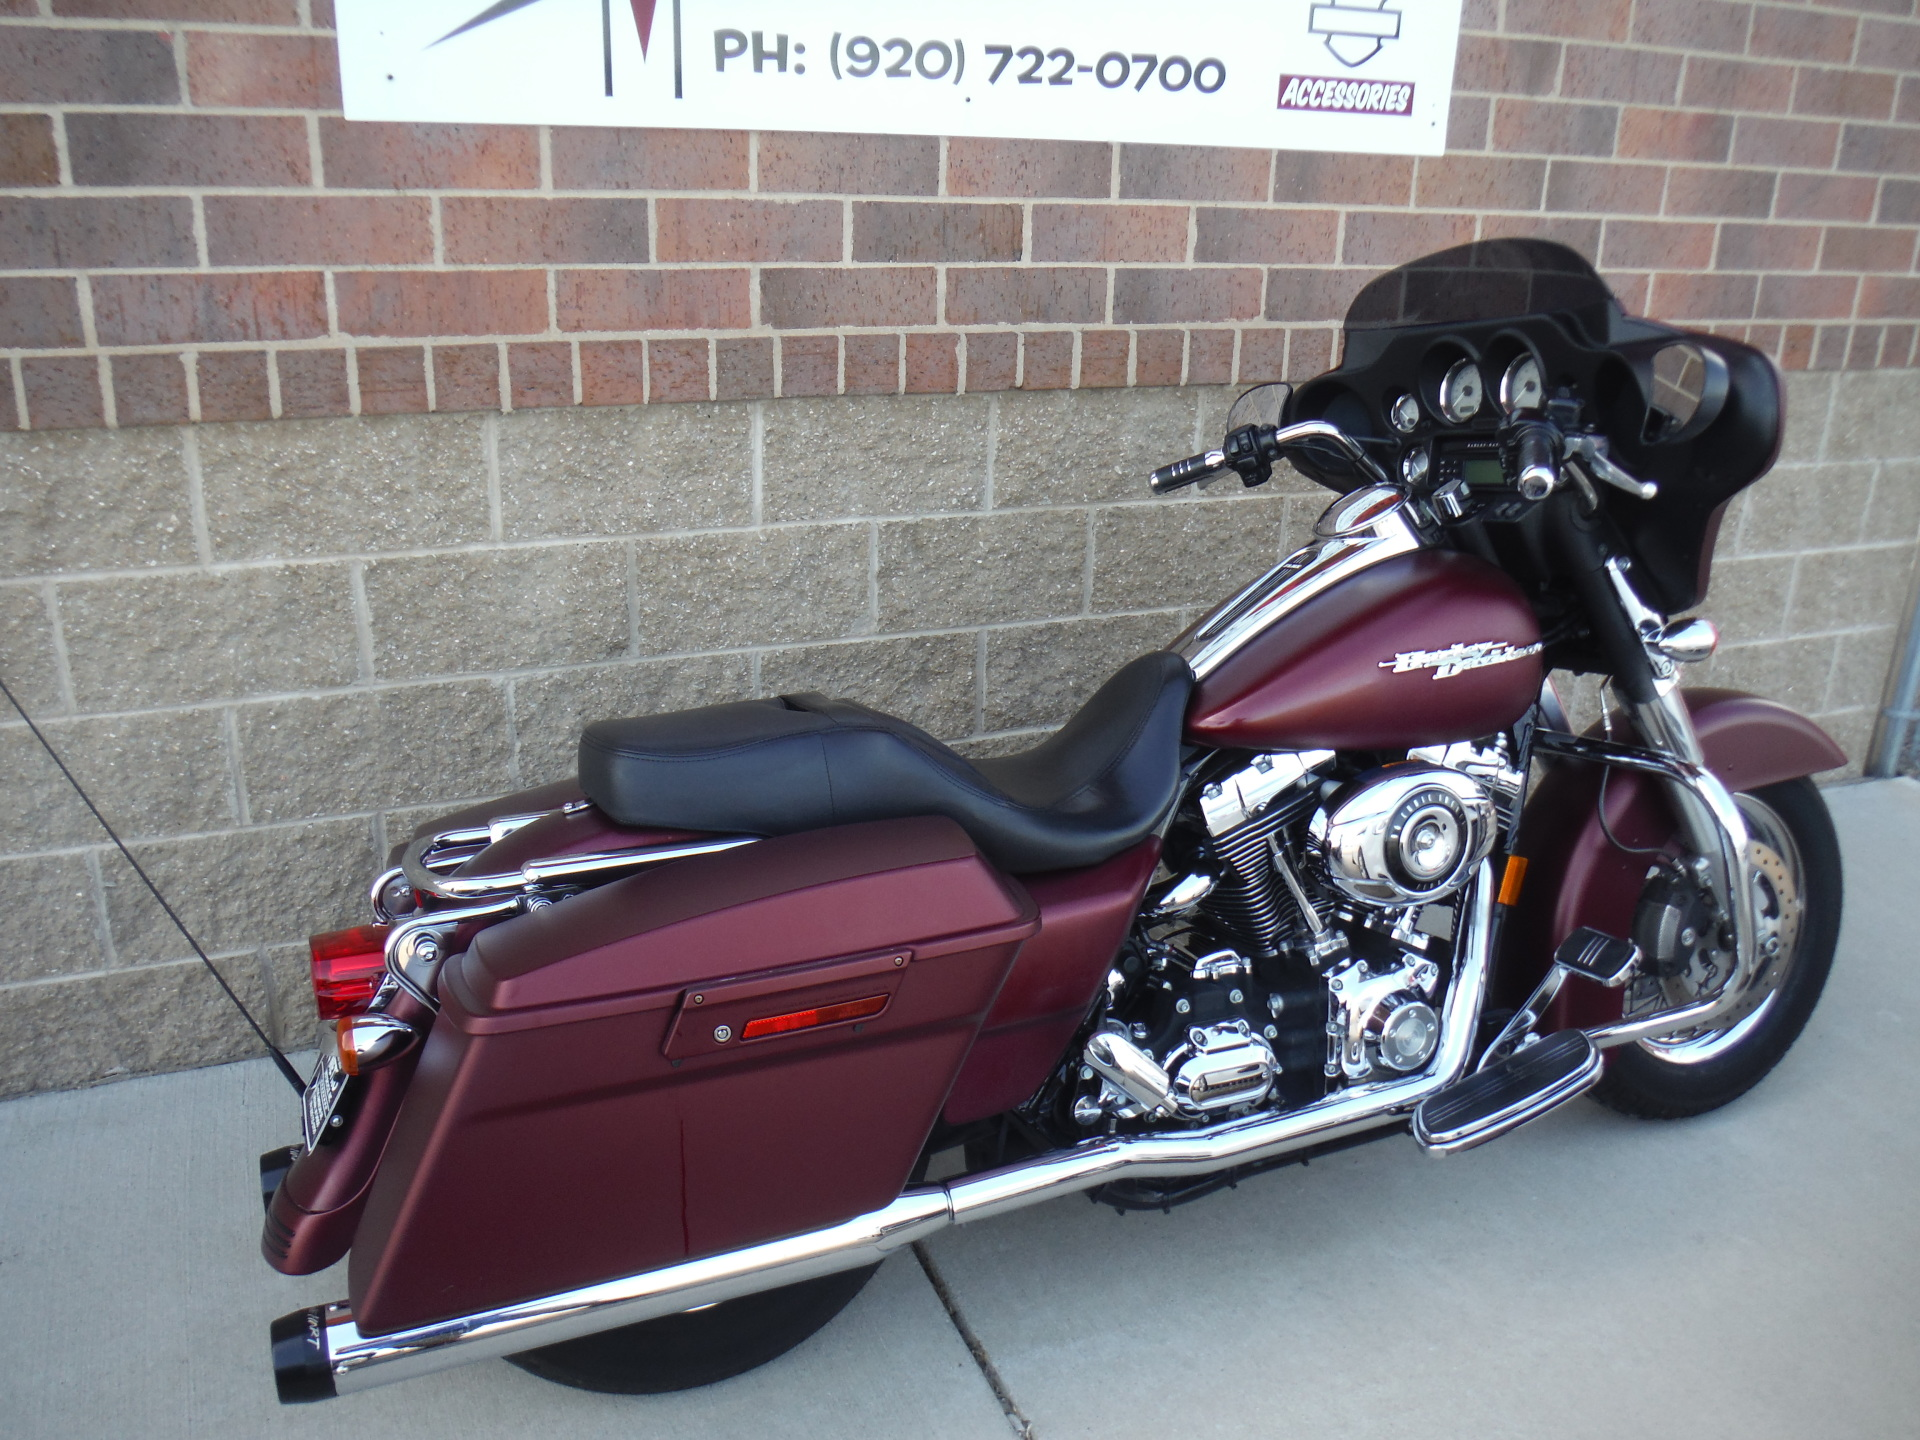 2008 Harley Davidson FLHX